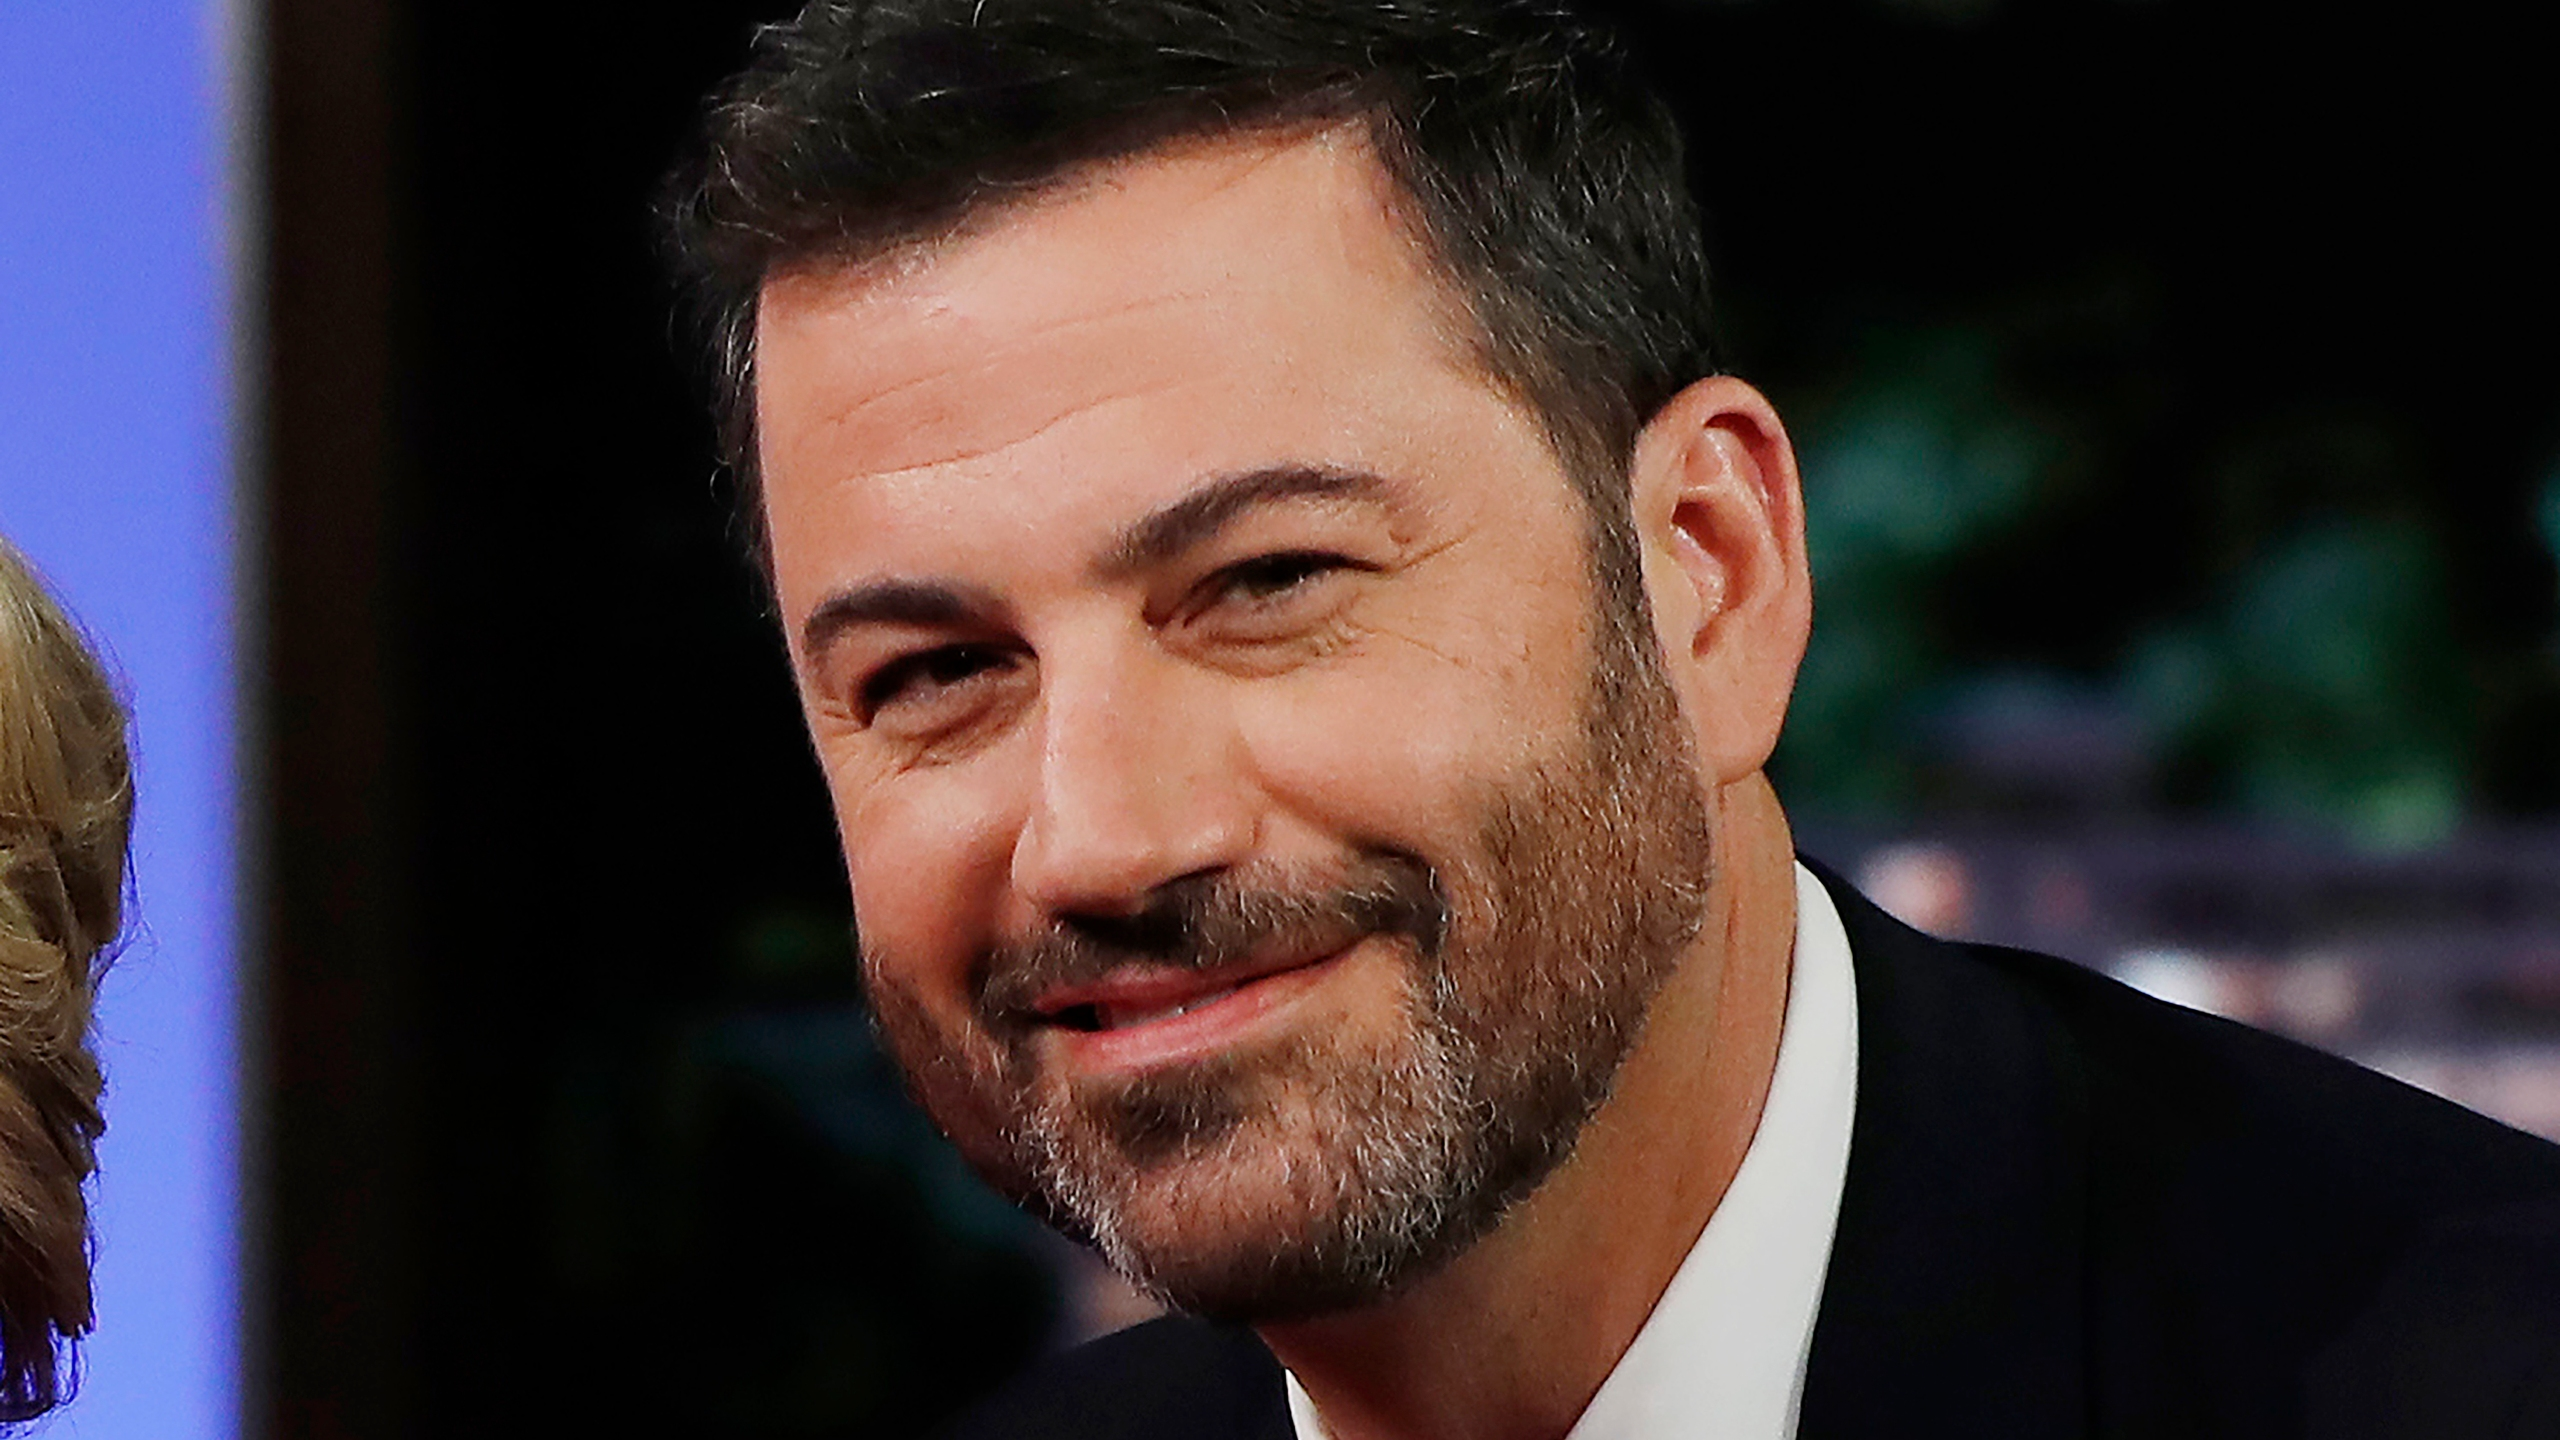 Jimmy Kimmel